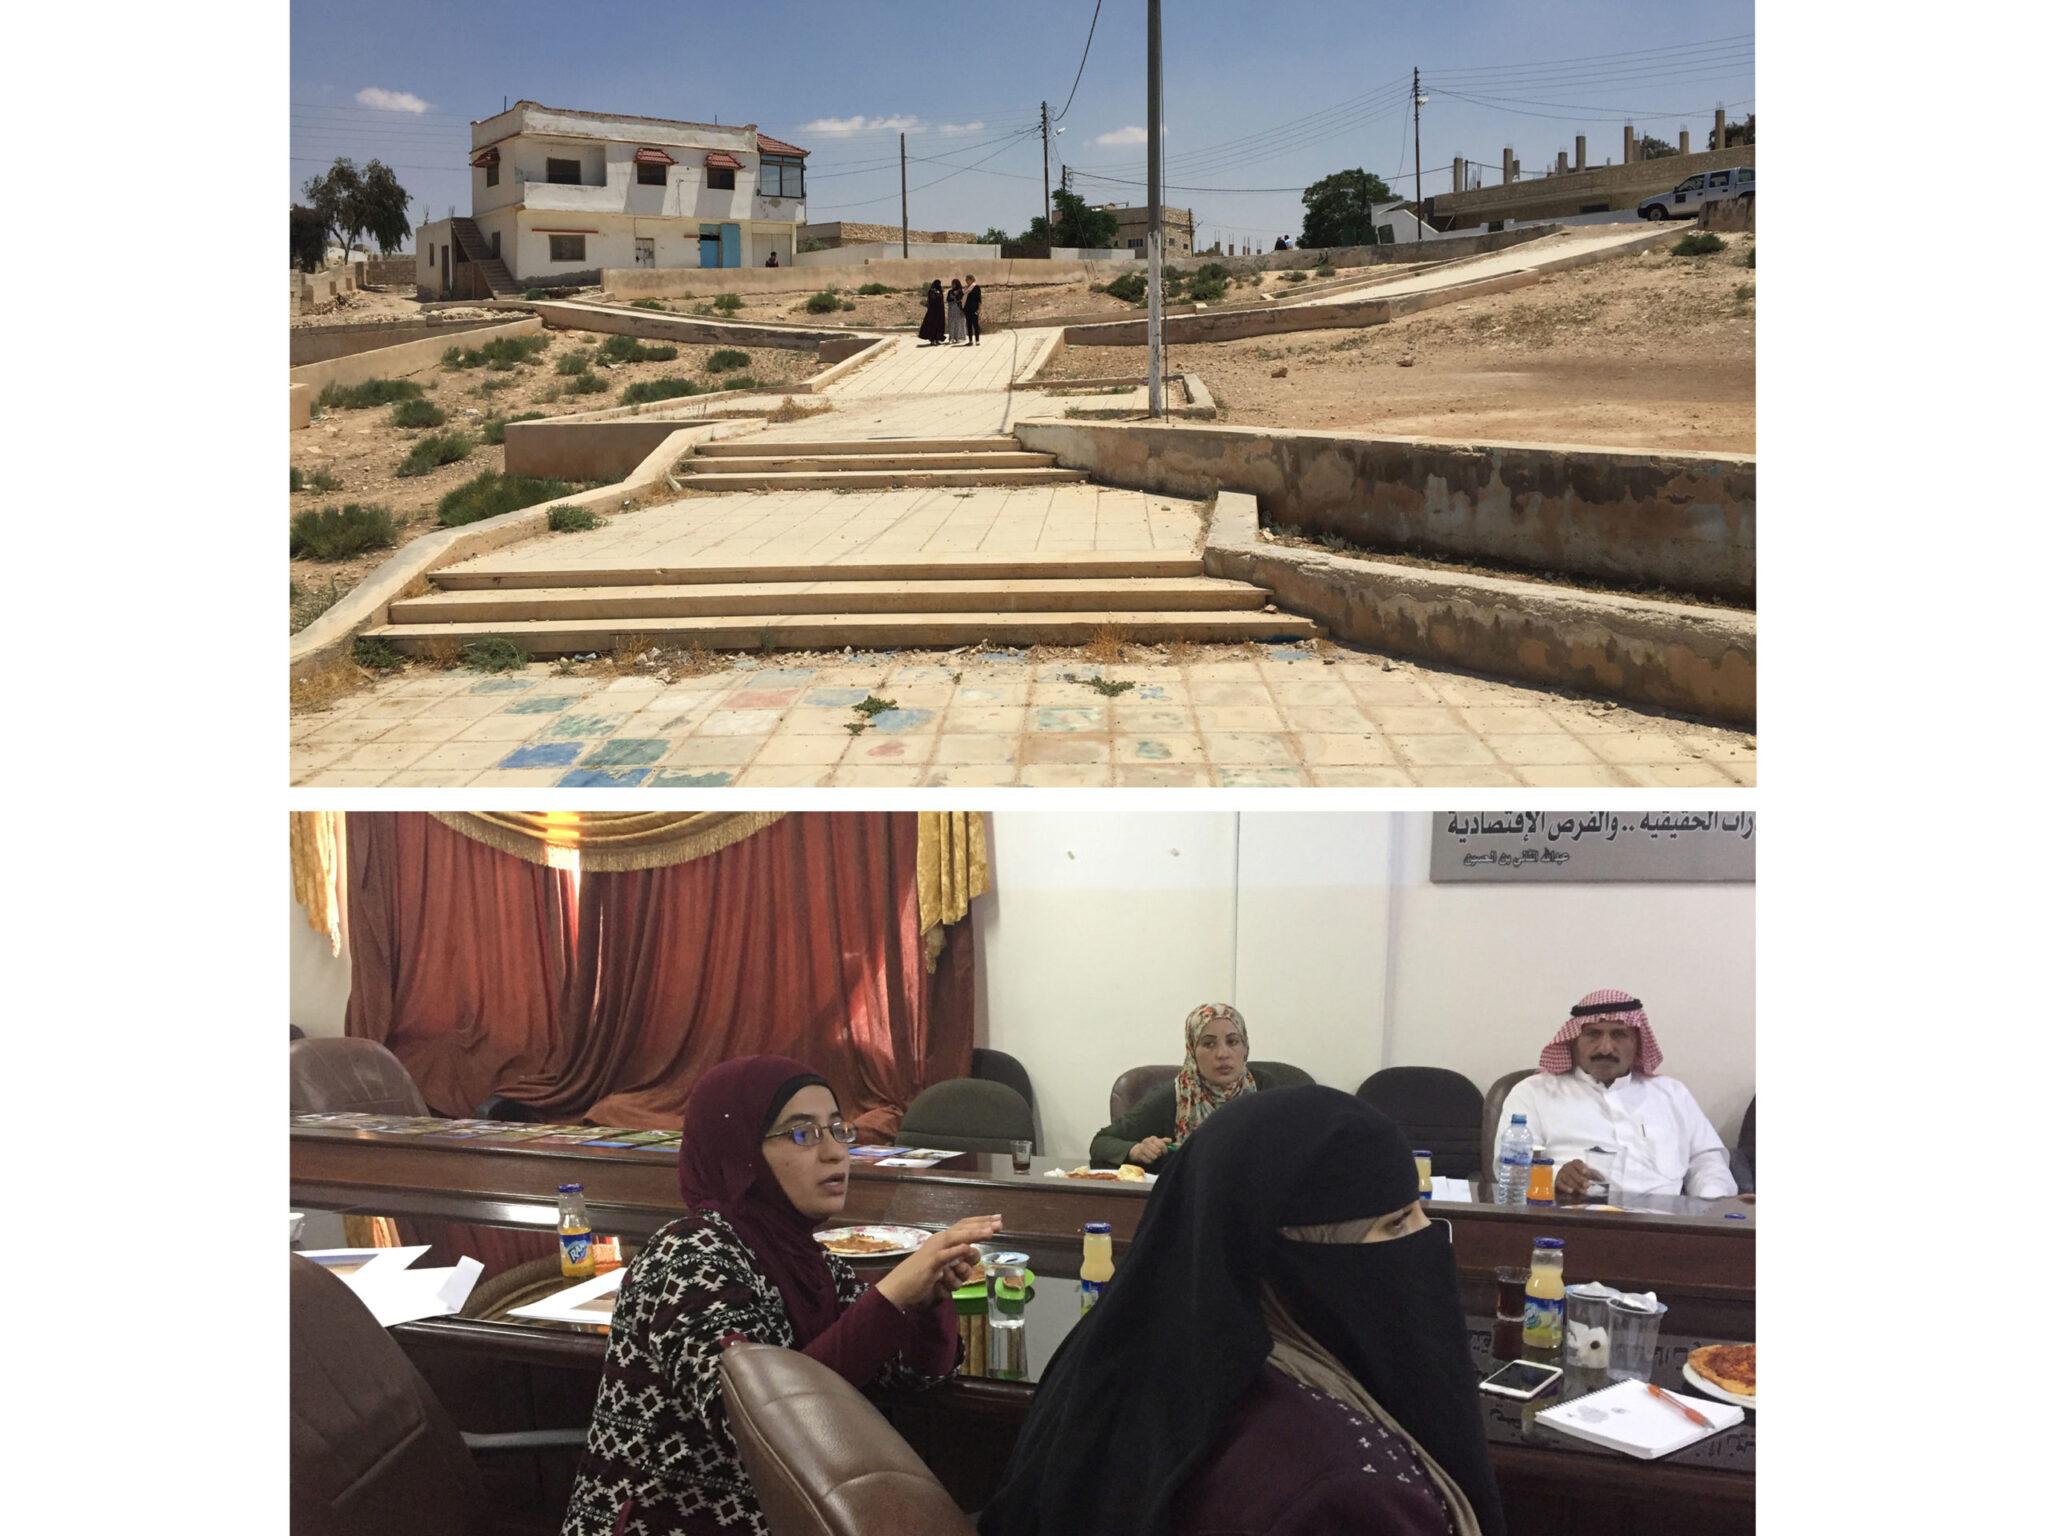 2018-07-30-jordanimg-3197-nieuws